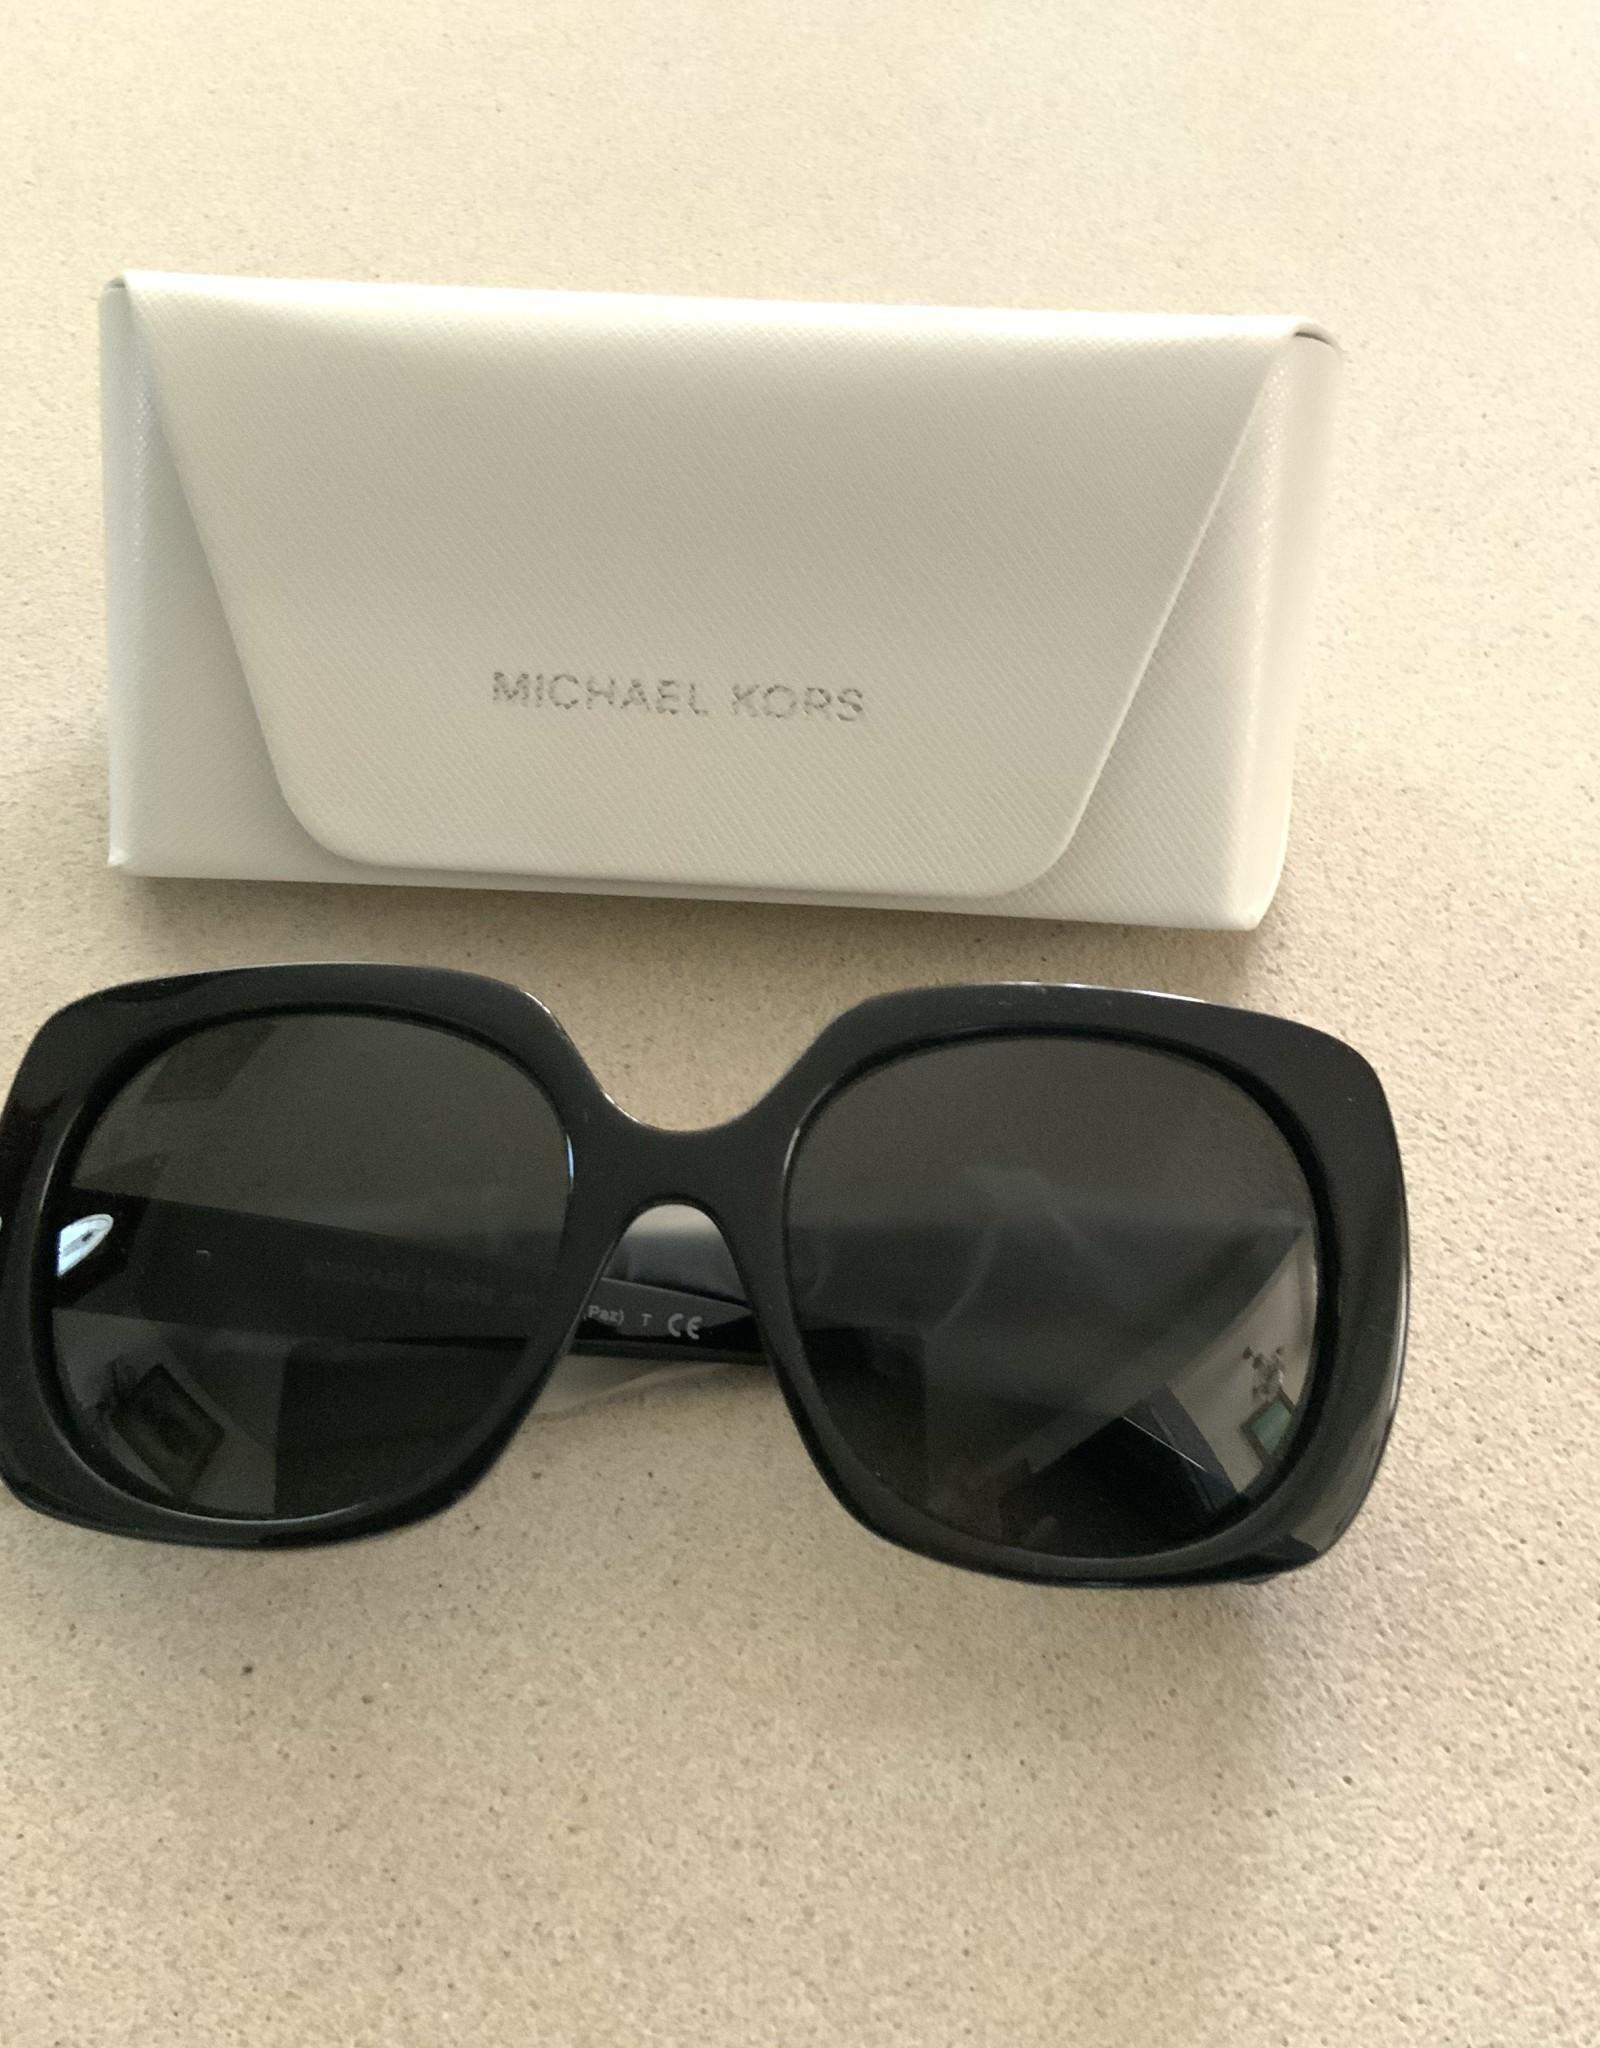 Michael Kors Michael Kors Sunglasses